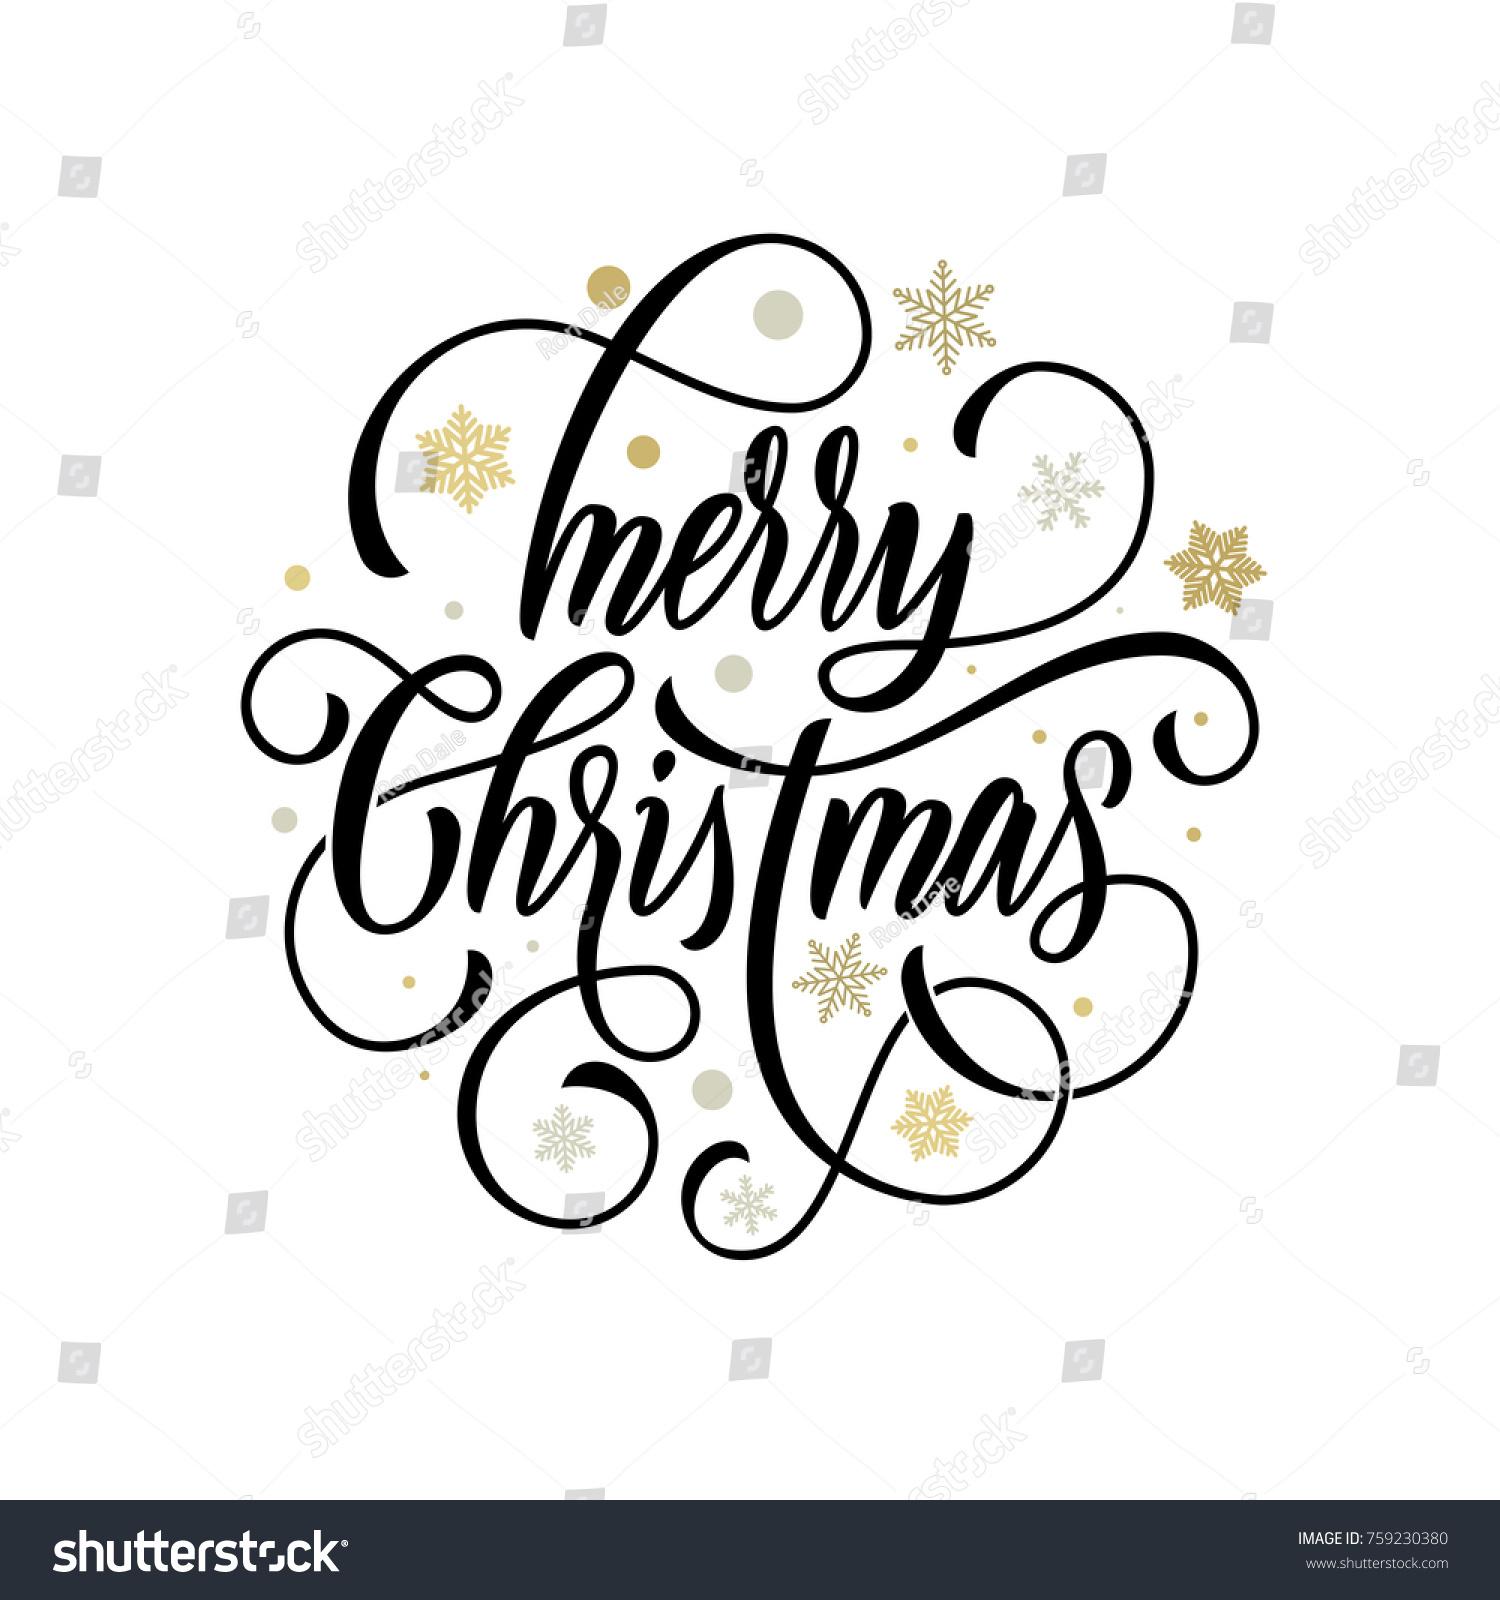 Merry christmas flourish hand drawn calligraphy immagine